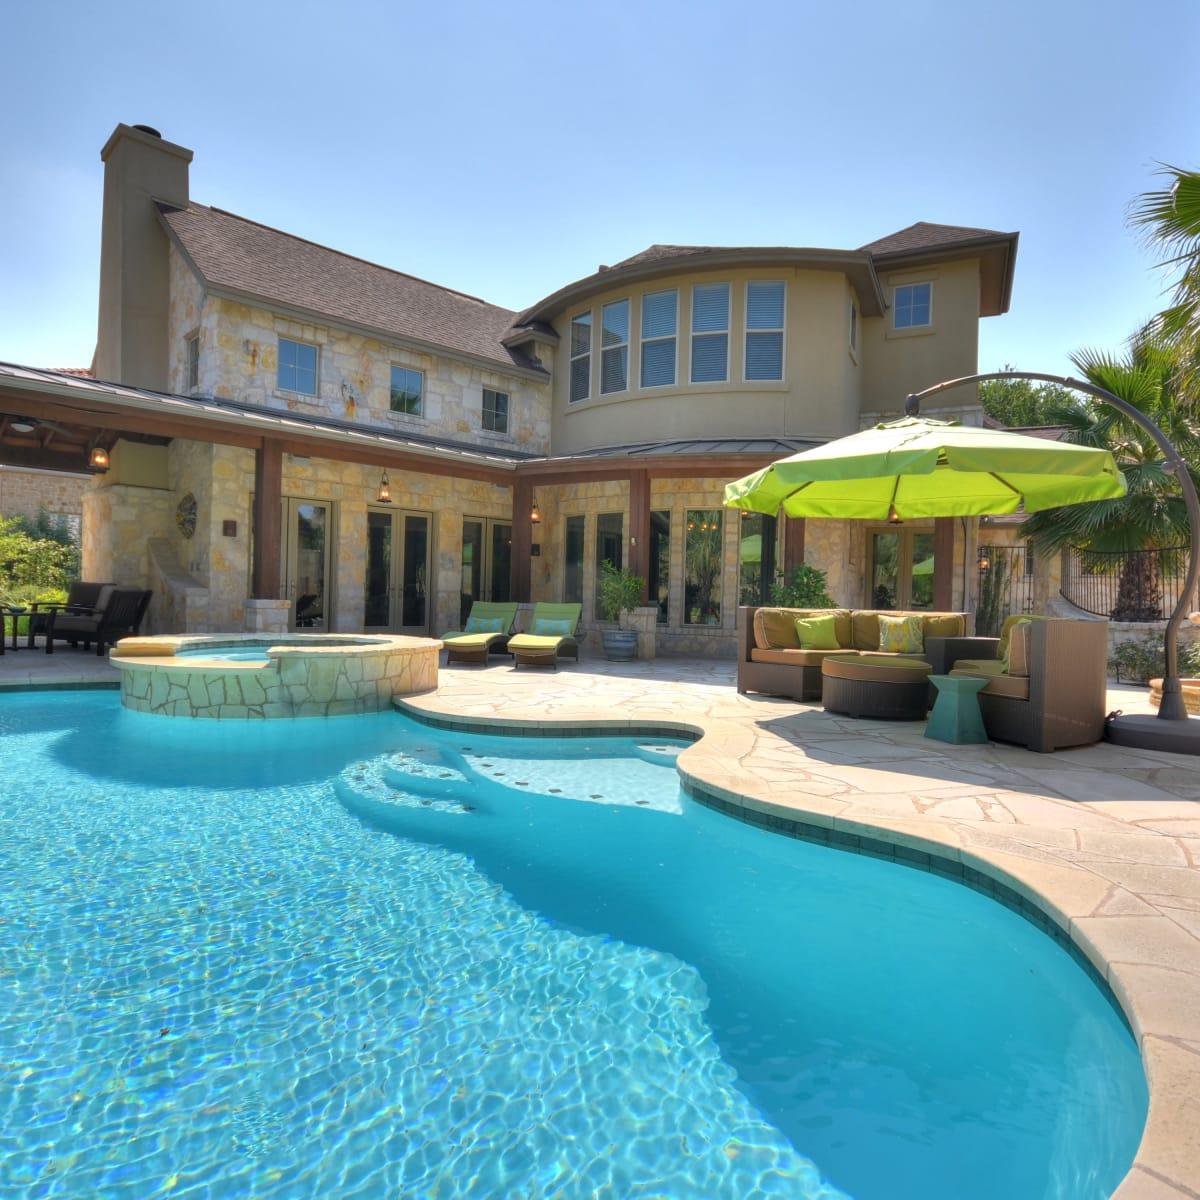 7200 Turnbuoy Austin house for sale pool